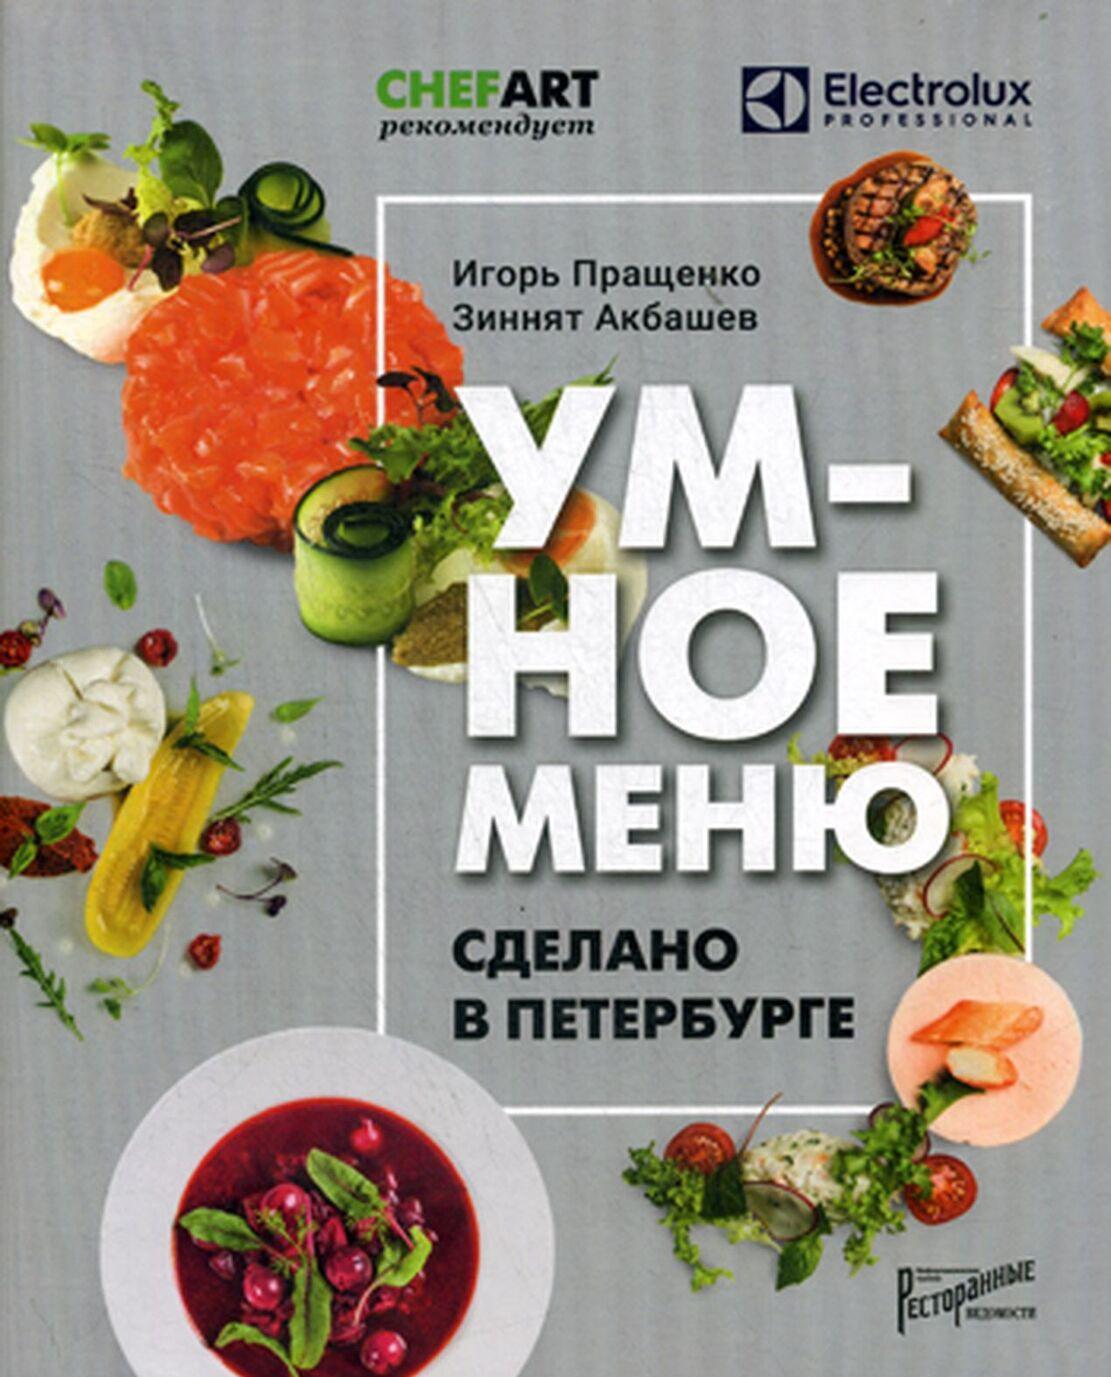 Umnoe menju. Sdelano v peterburge | Akbashev Zinnjat Dalilovich, Praschenko Igor Aleksandrovich